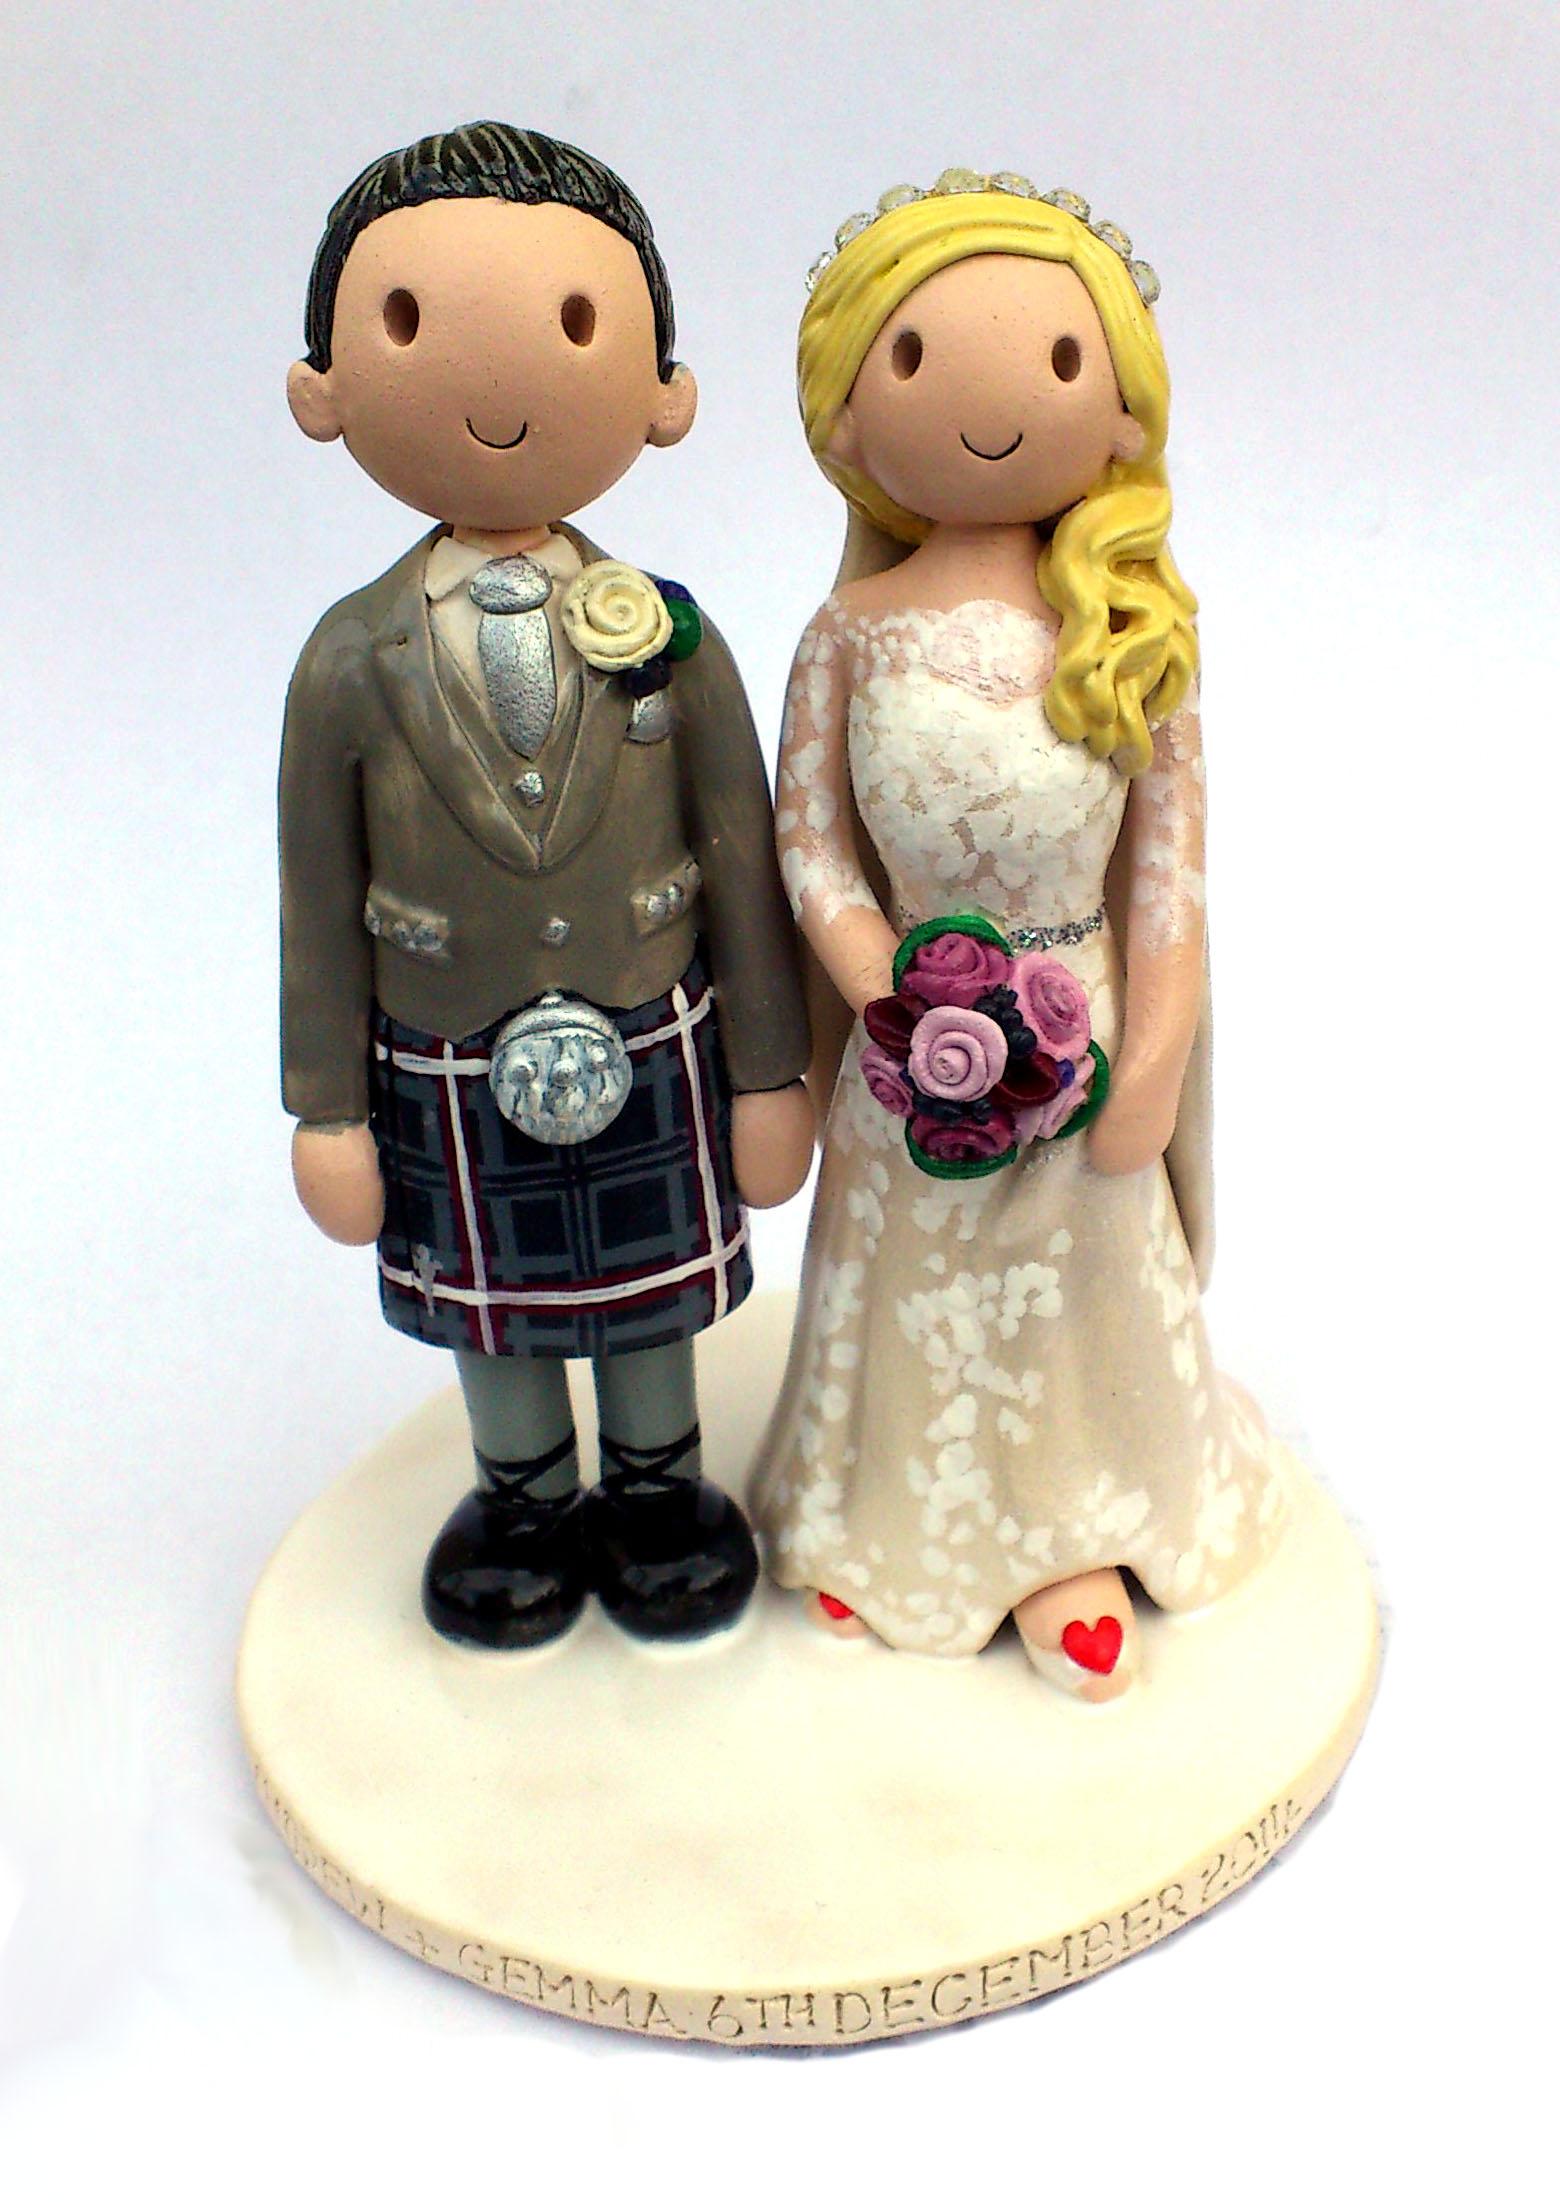 Wedding Cake Decorations Uk Only : Wedding Cake Toppers